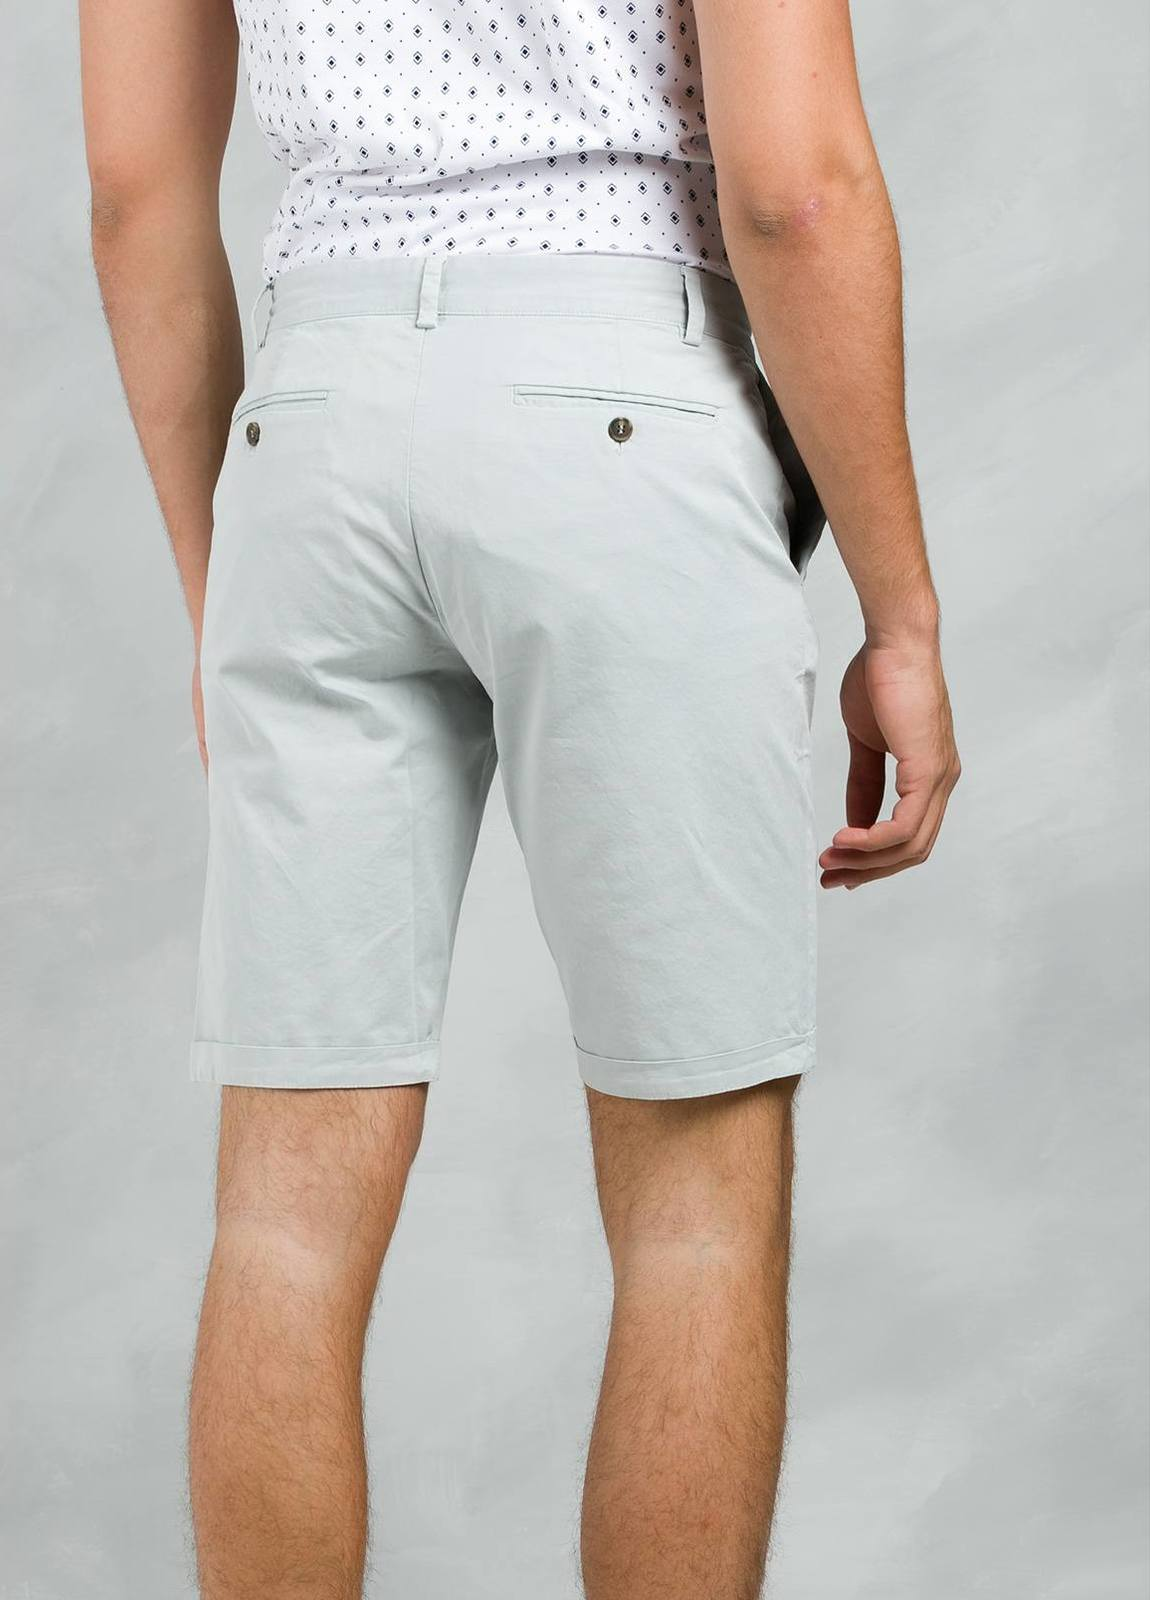 Bermuda ligeramente slim fit color gris, 100% Algodón. - Ítem2